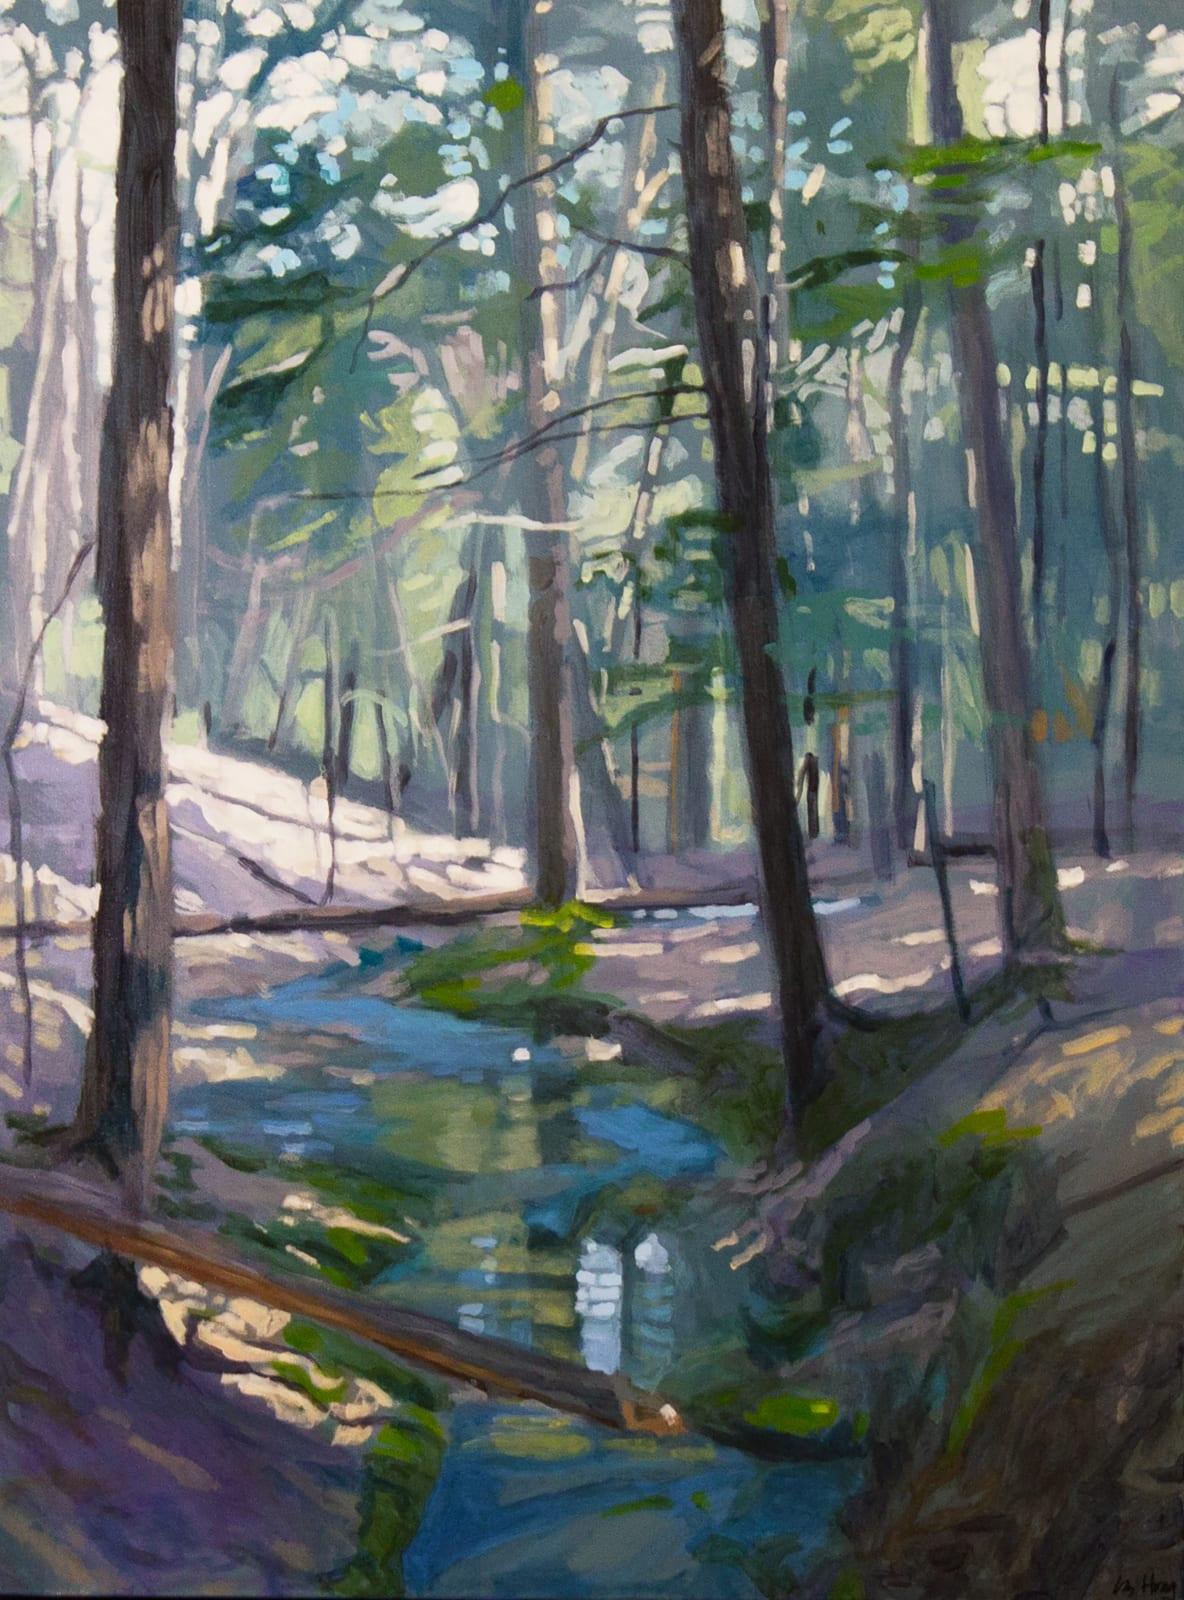 Liz Hoag: Beyond The Trees